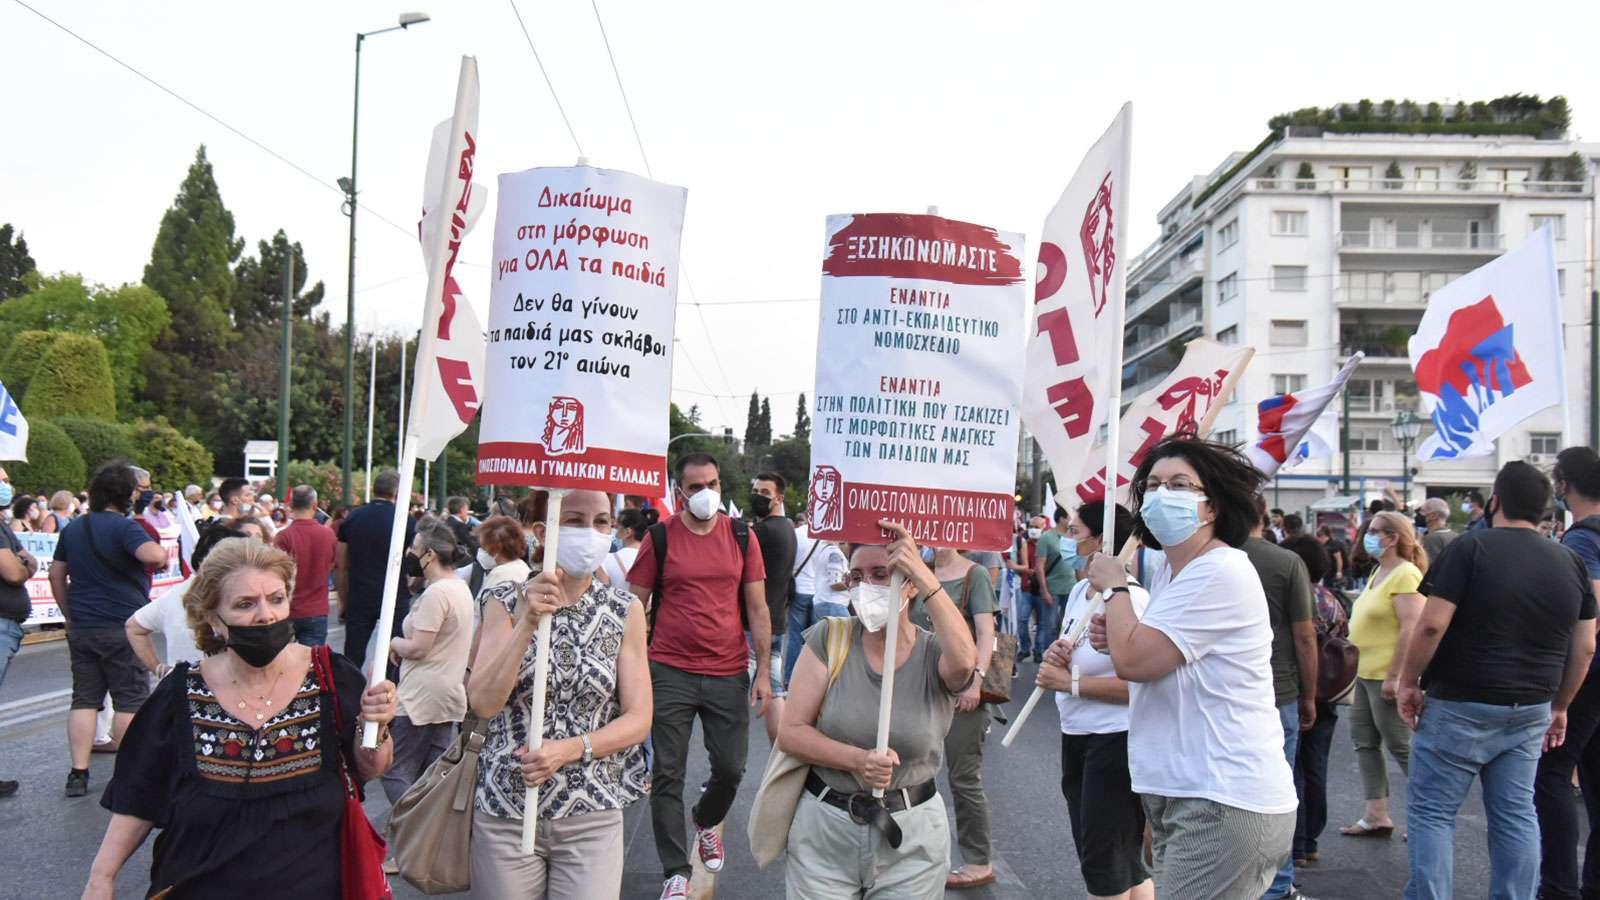 kinhtopoihsh paideia Πανεκπαιδευτικό Σύνταγμα 4 ΟΓΕ